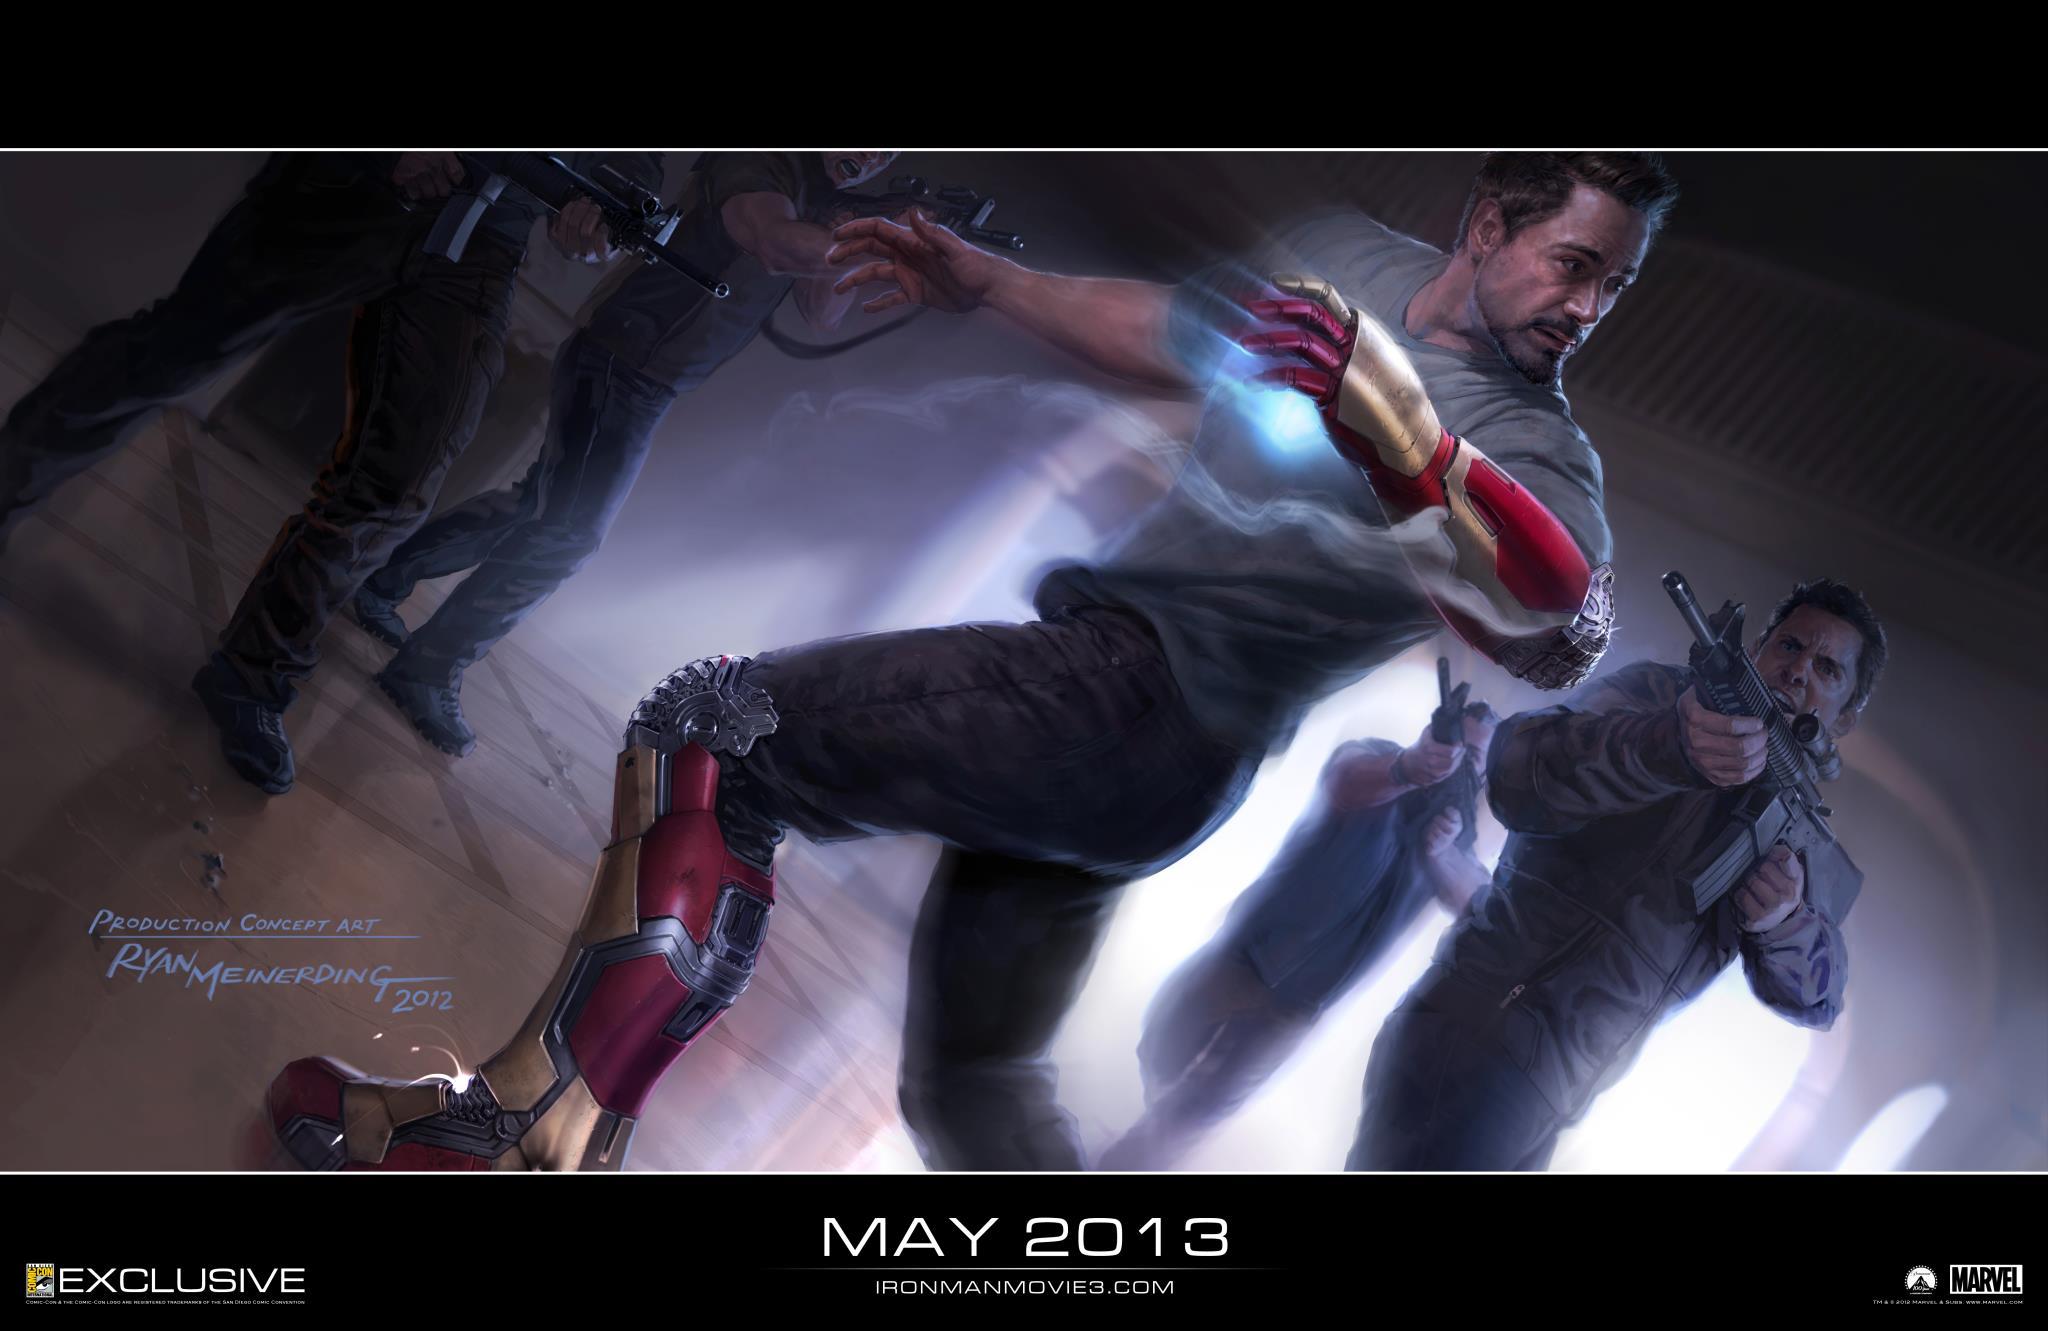 iron-man-3-concept-art.jpg